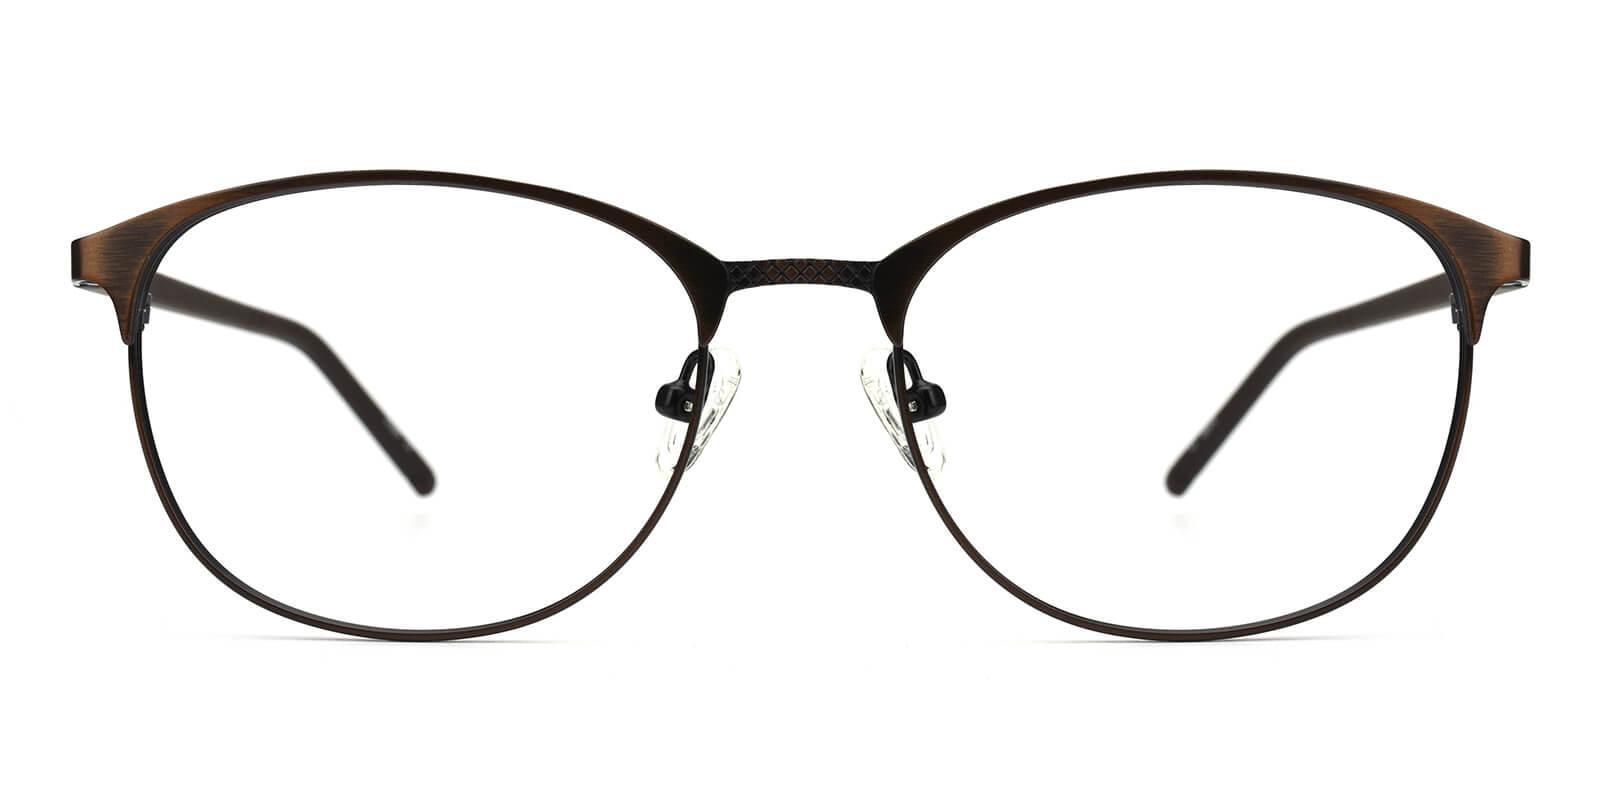 Gorge-Brown-Round-Metal-Eyeglasses-additional2